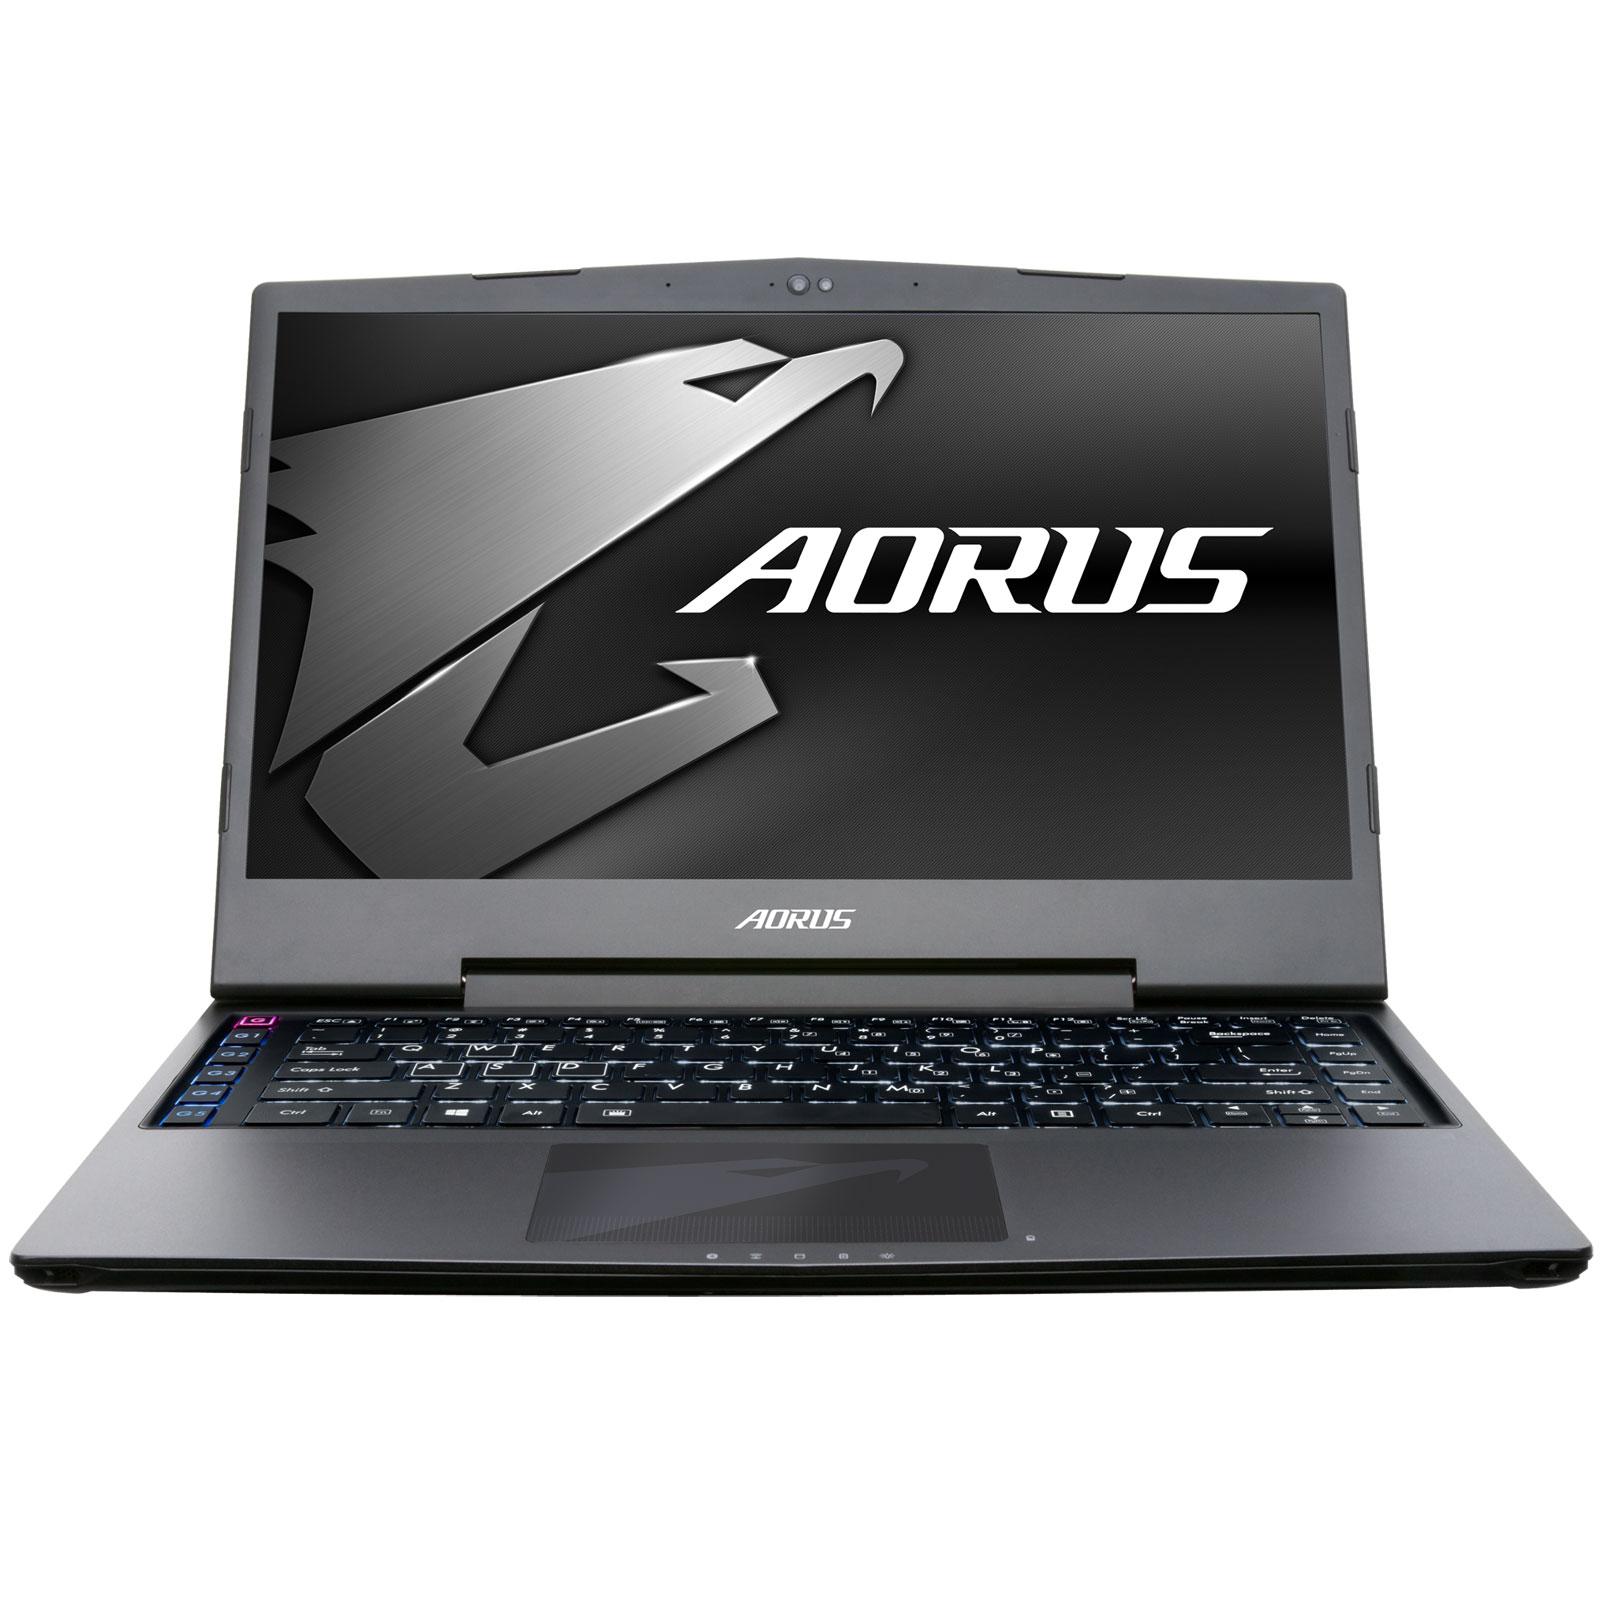 "PC portable AORUS X3 Plus v7 K1NW10-FR Intel Core i7-7820HK 16 Go SSD 512 Go 13.9"" LED QHD+ NVIDIA GeForce GTX 1060 6 Go Wi-Fi AC/Bluetooth Webcam Windows 10 Famille 64 bits"